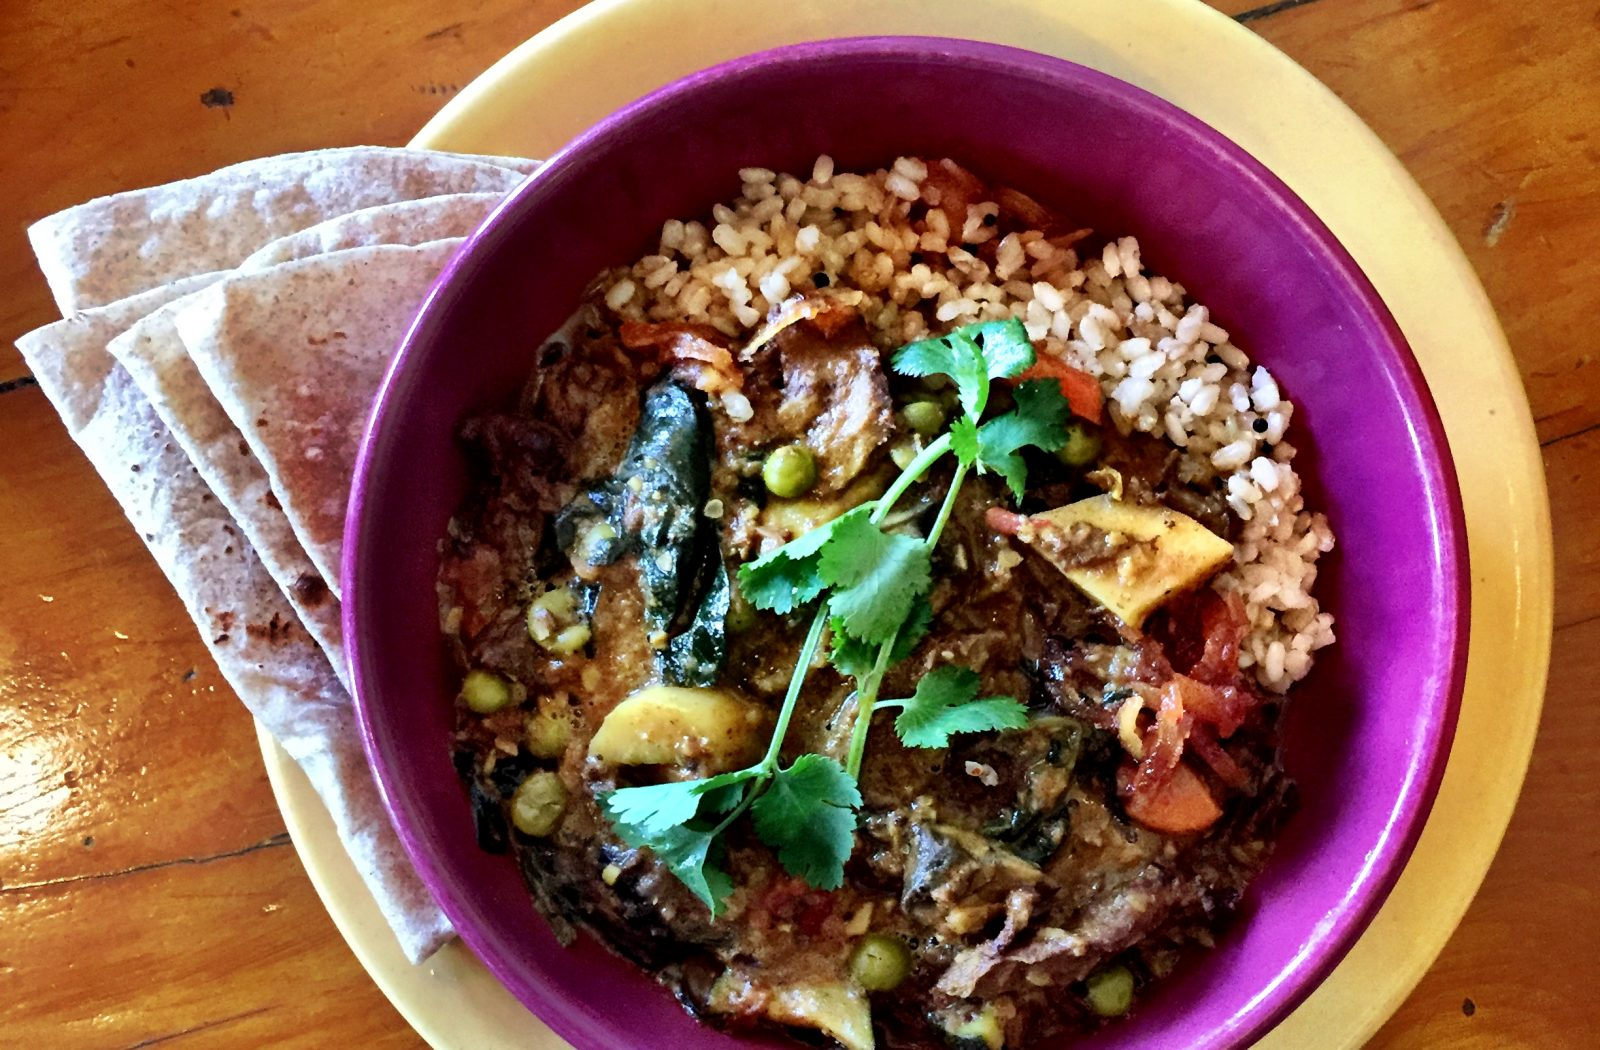 White or brown basmati rice: the health benefits, according to Ayurveda